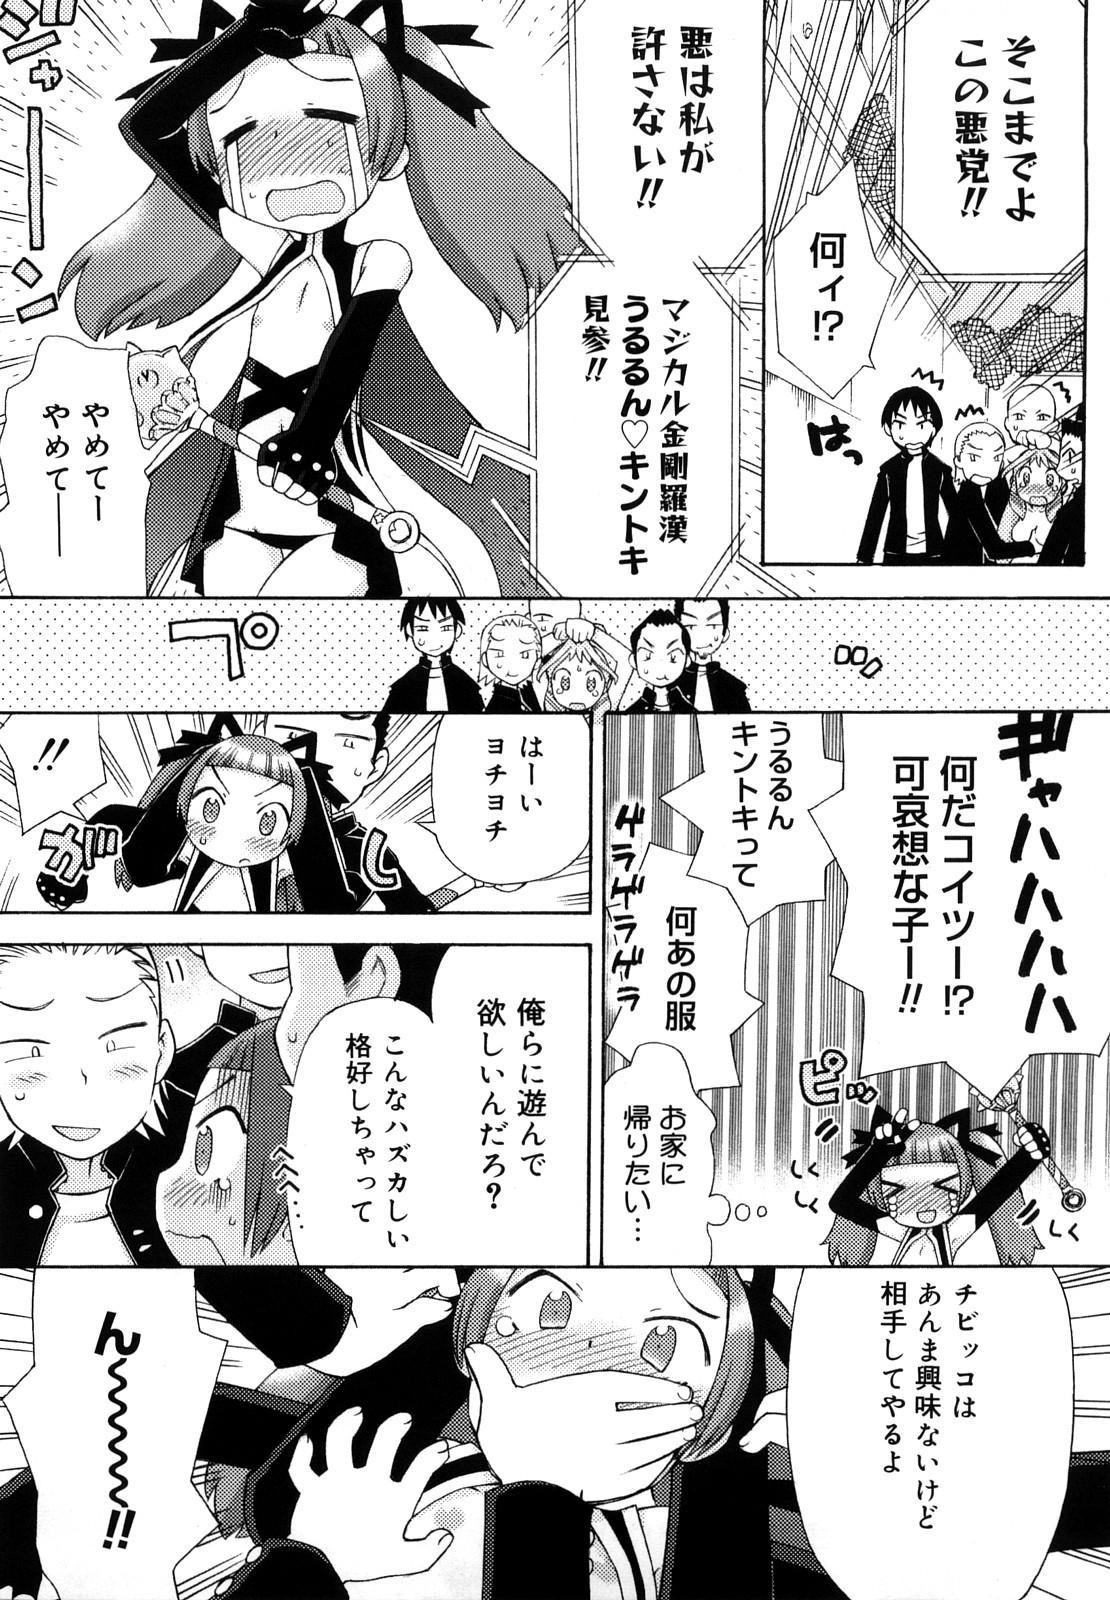 Hatsuden Pandakun! Shinsouban 113